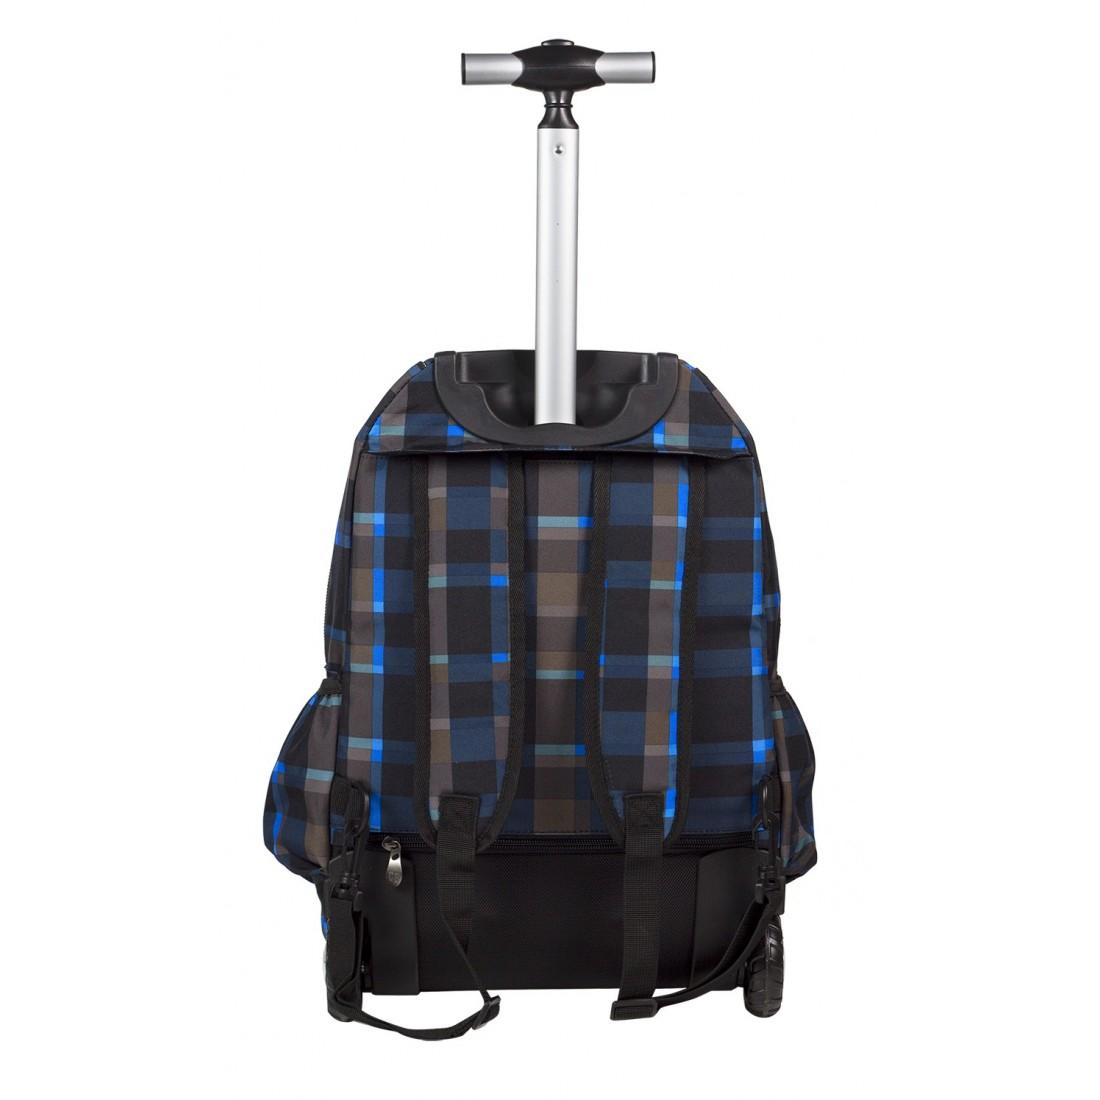 Plecak na kółkach CoolPack Junior TEXAS CP 073a - plecak-tornister.pl